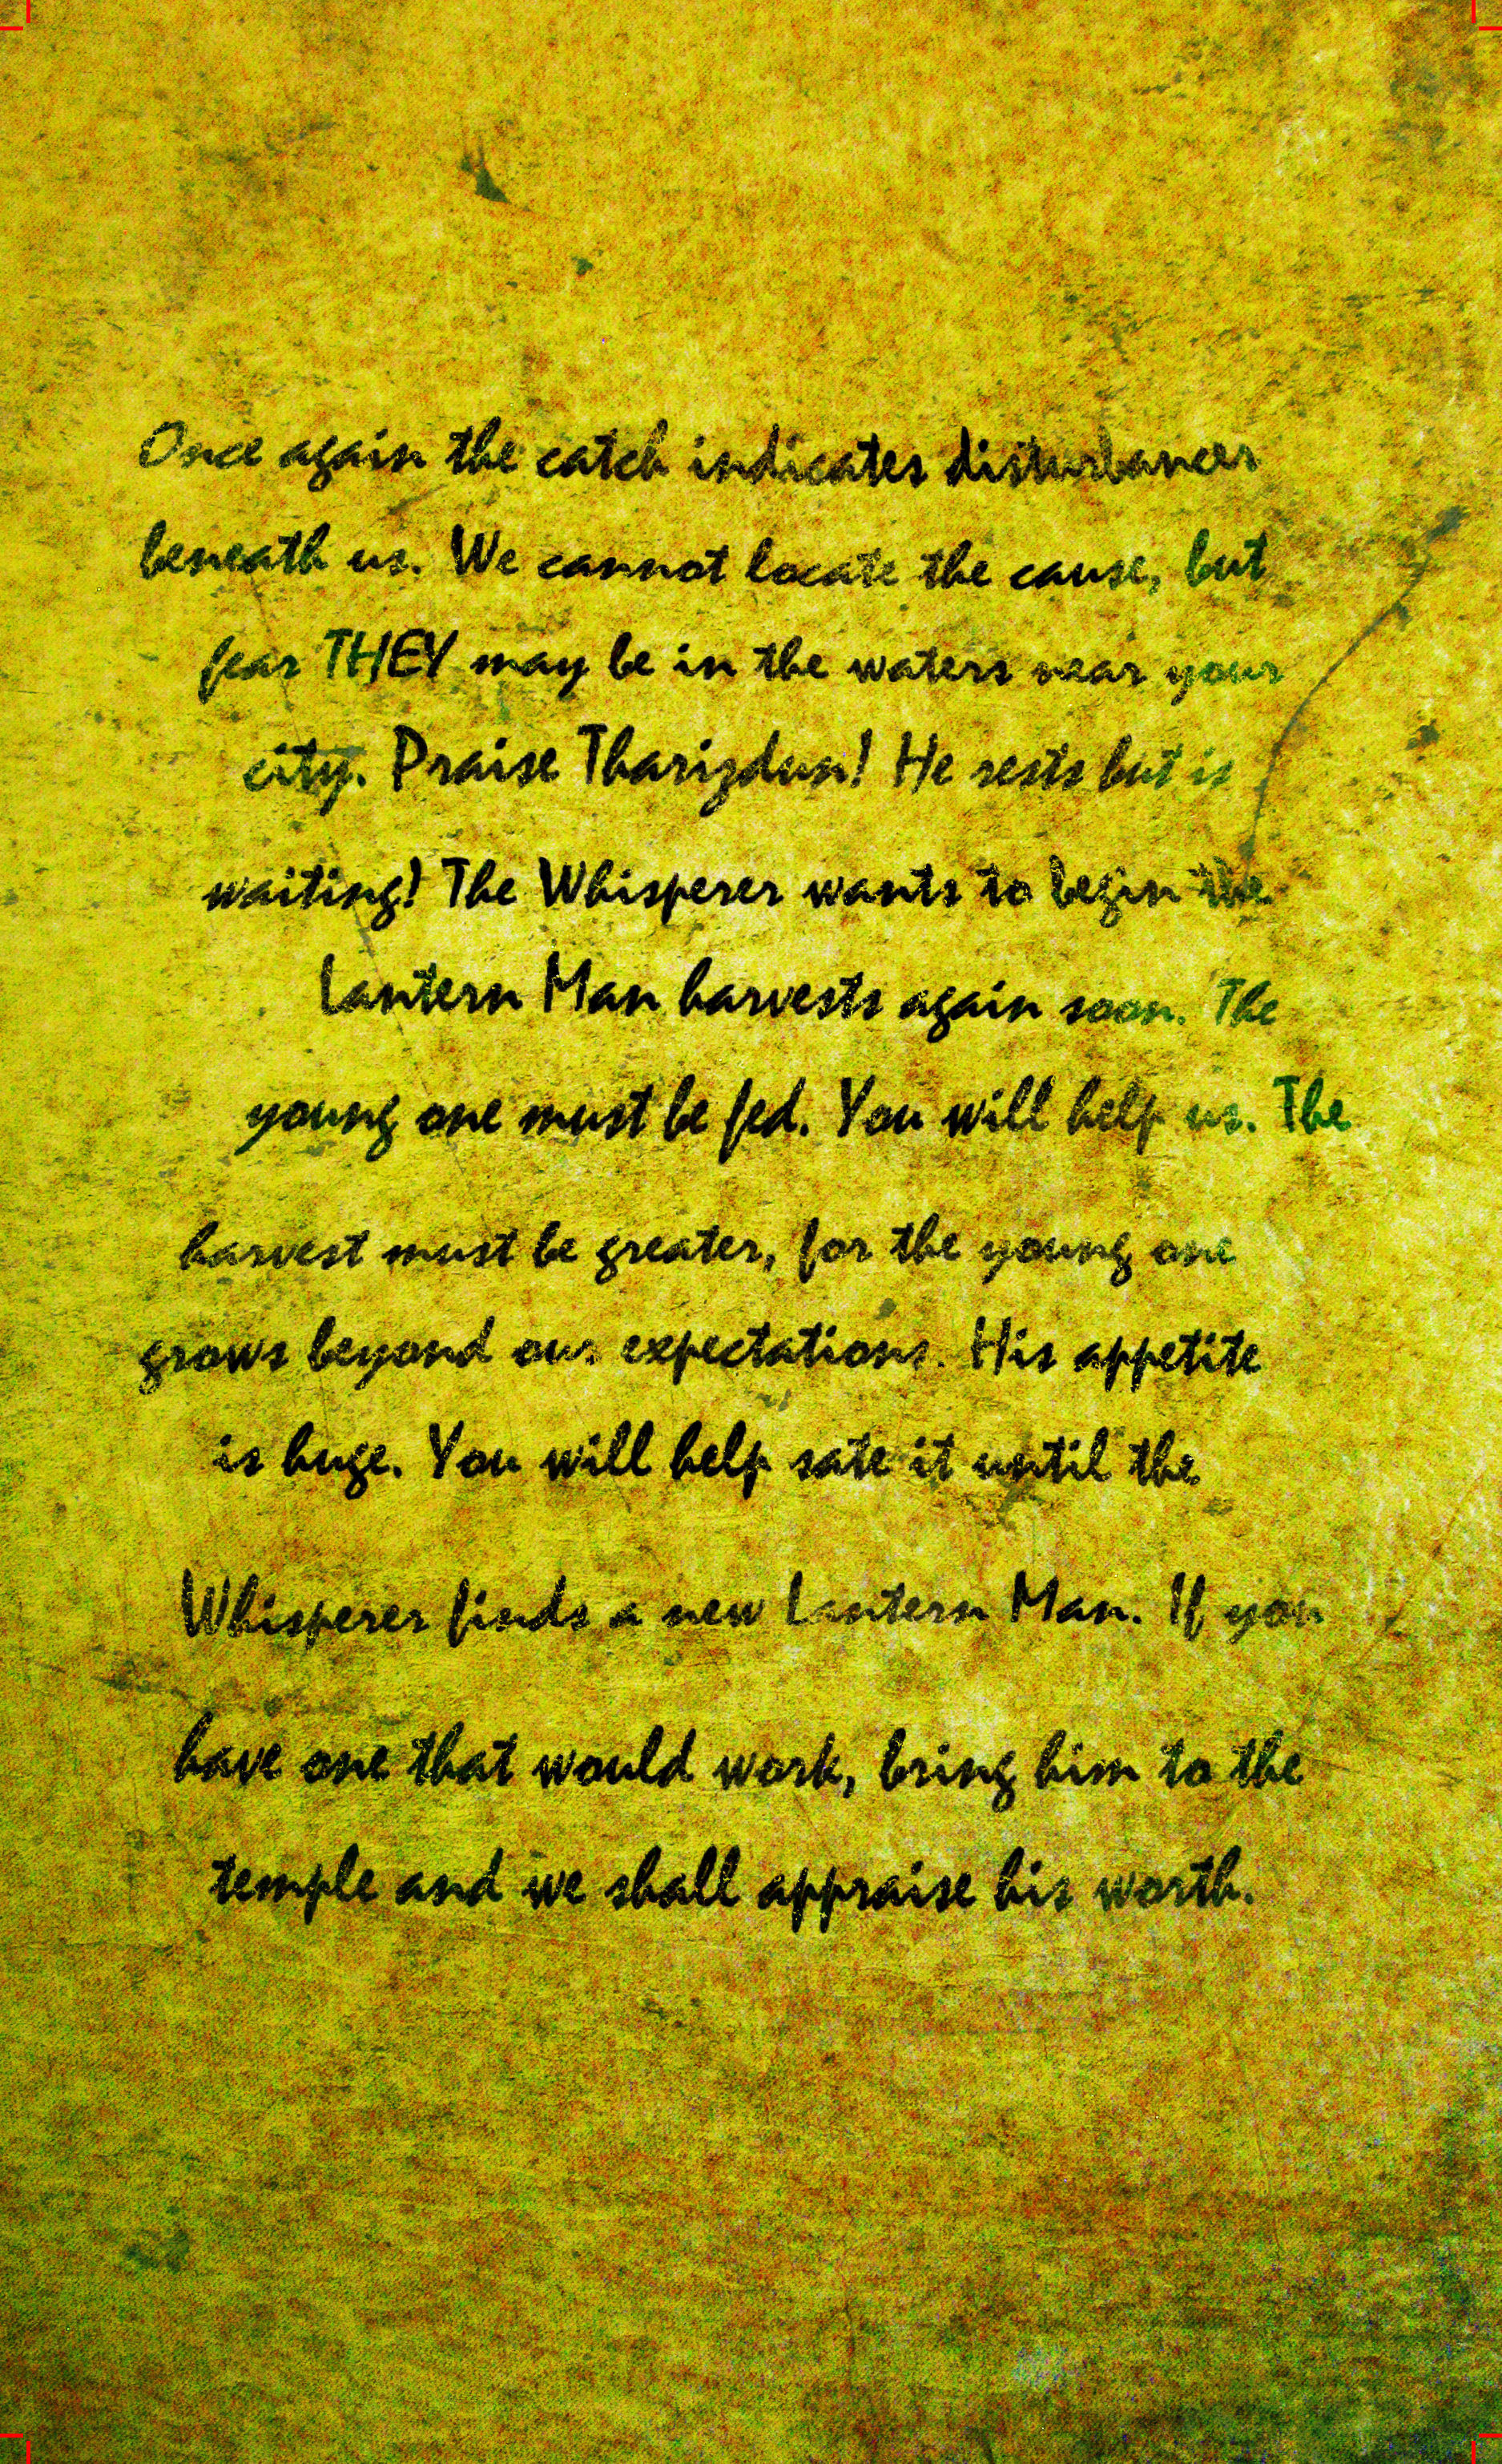 Note 01 Letter in Dory's Chamber - 01_300dpi_6x10.jpg